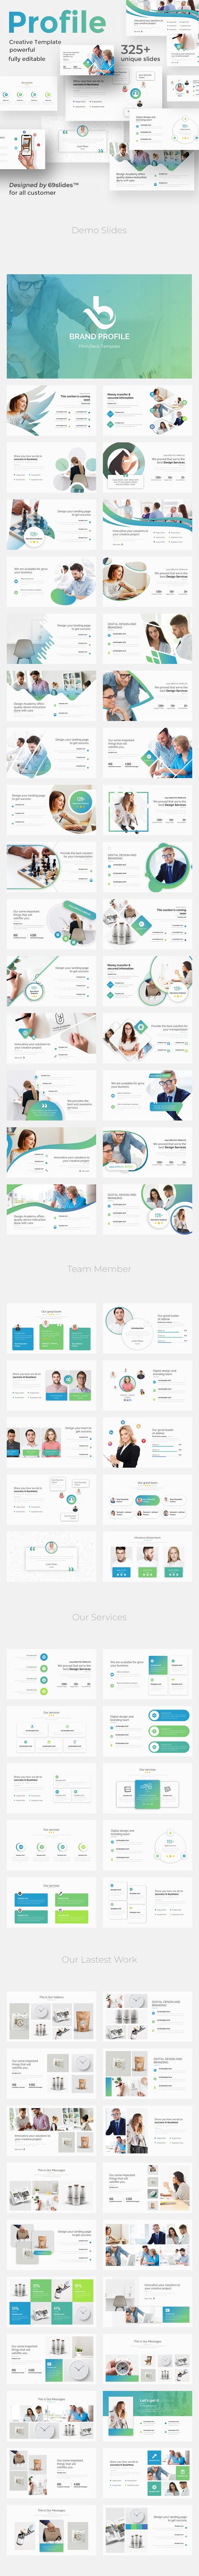 Brand Profile Pitch Deck Keynote Template - Business Keynote Templates